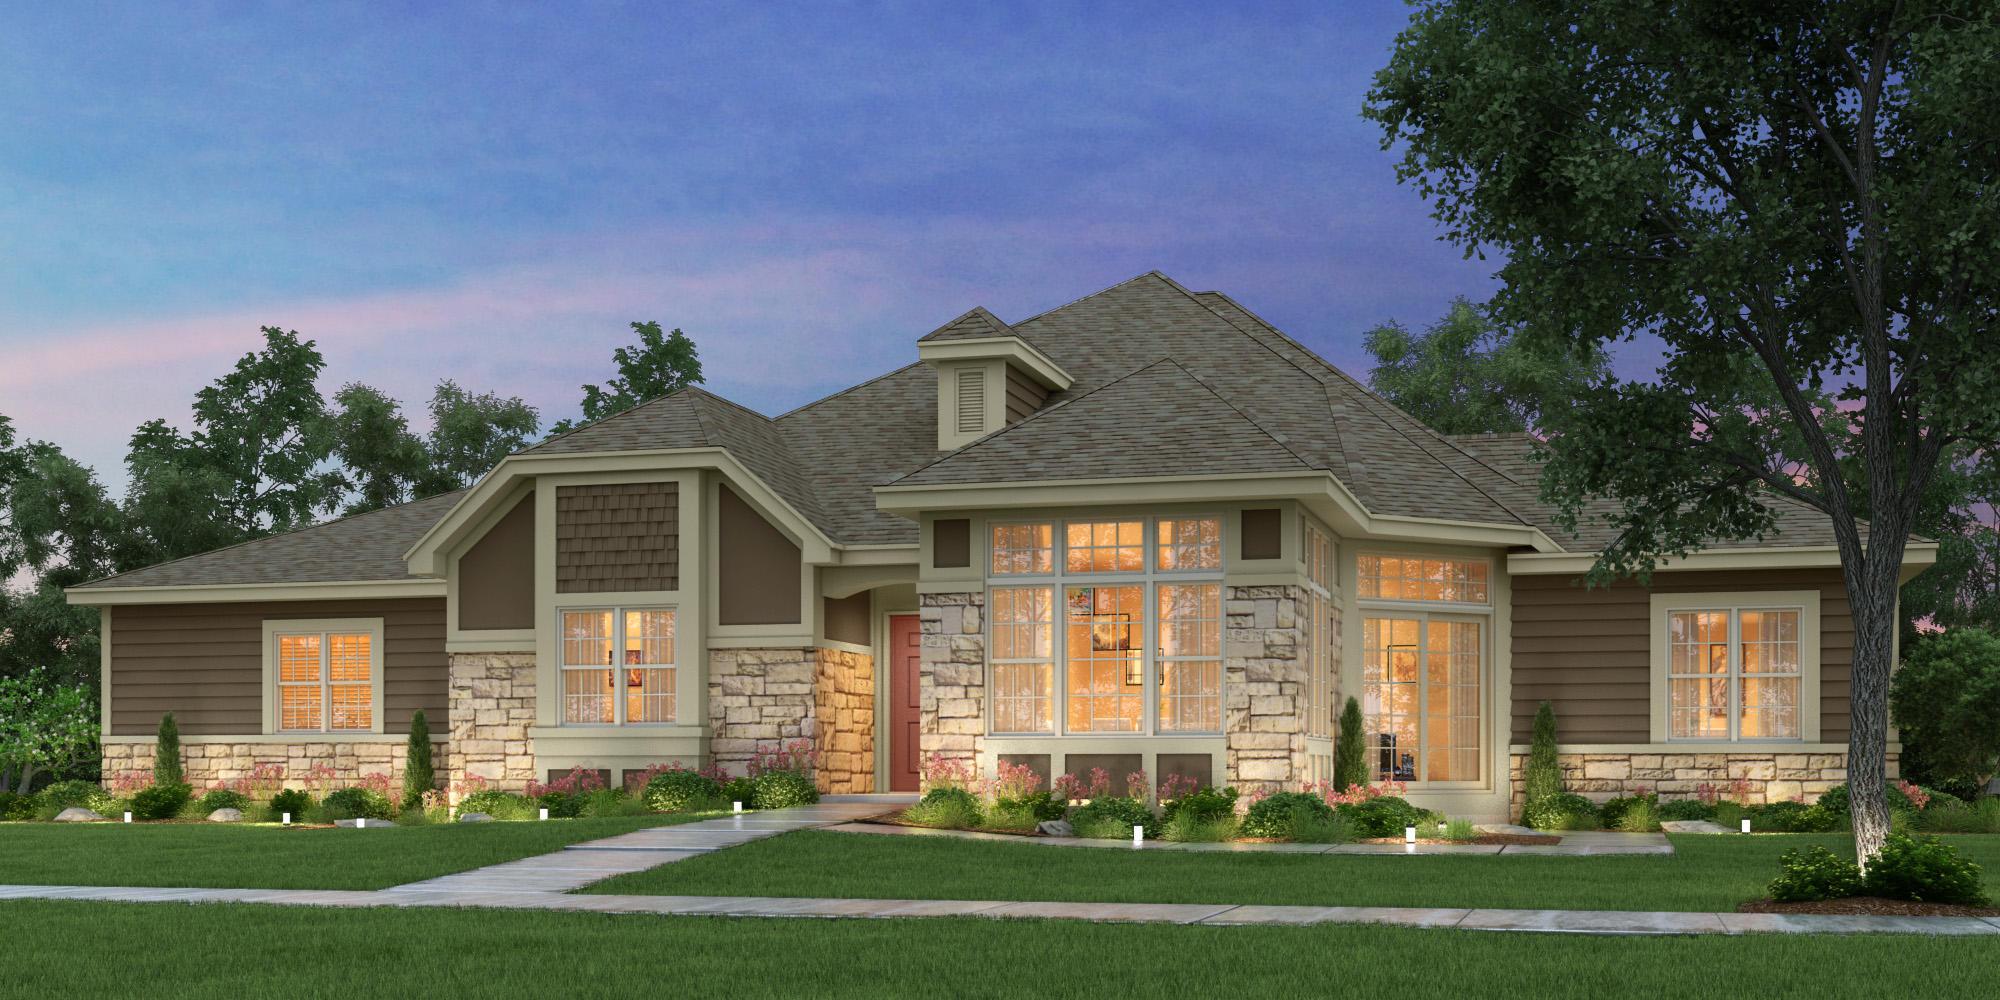 13795 Creekside Pass, Brookfield, Wisconsin 53005, 2 Bedrooms Bedrooms, 7 Rooms Rooms,2 BathroomsBathrooms,Condominium,For Sale,Creekside Pass,1721390